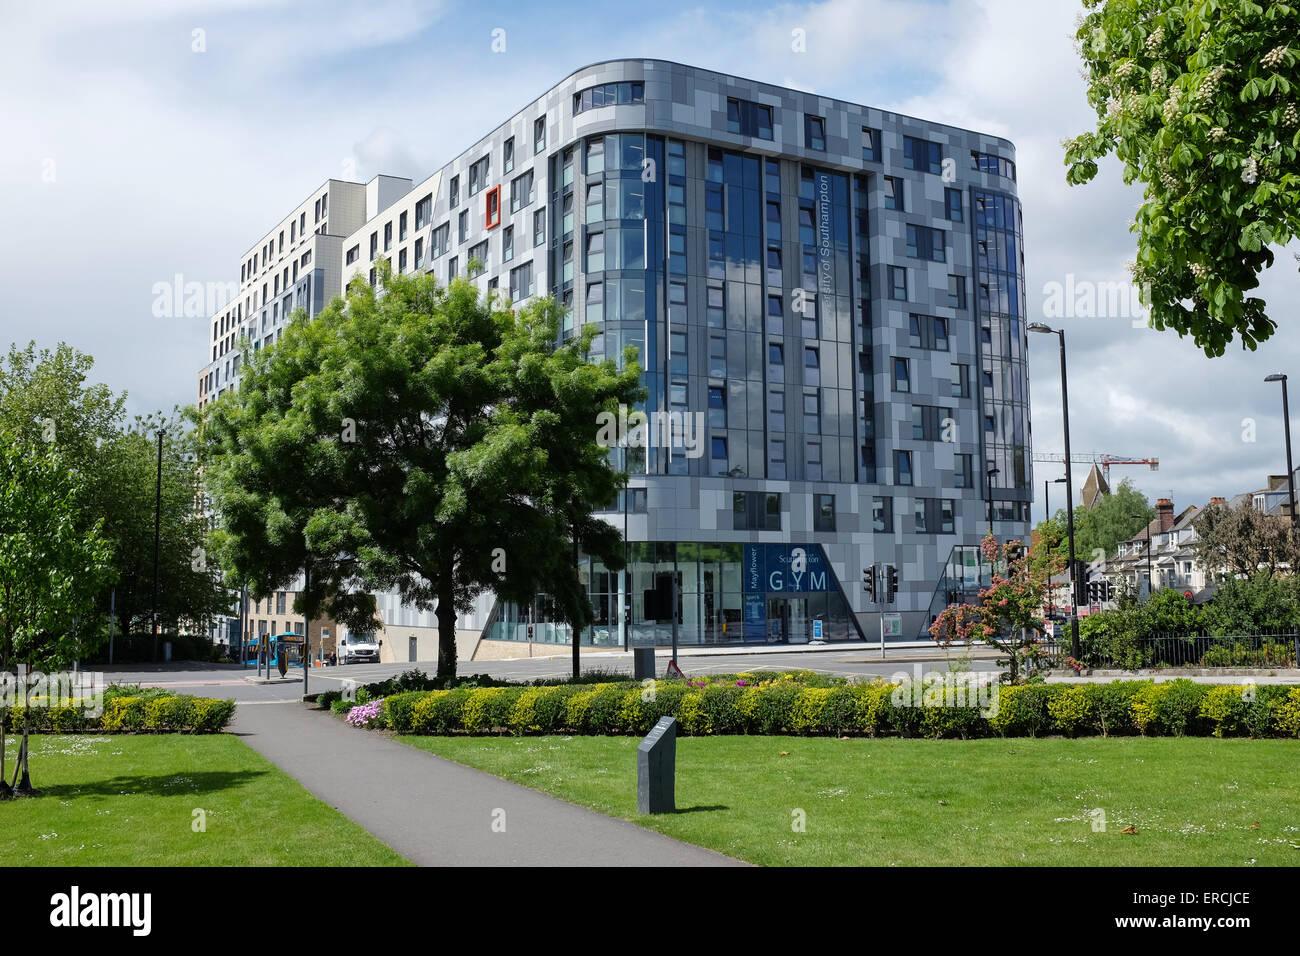 Mayflower Hallen, neuen University of Southampton studentisches Wohnen in Southampton Stockbild